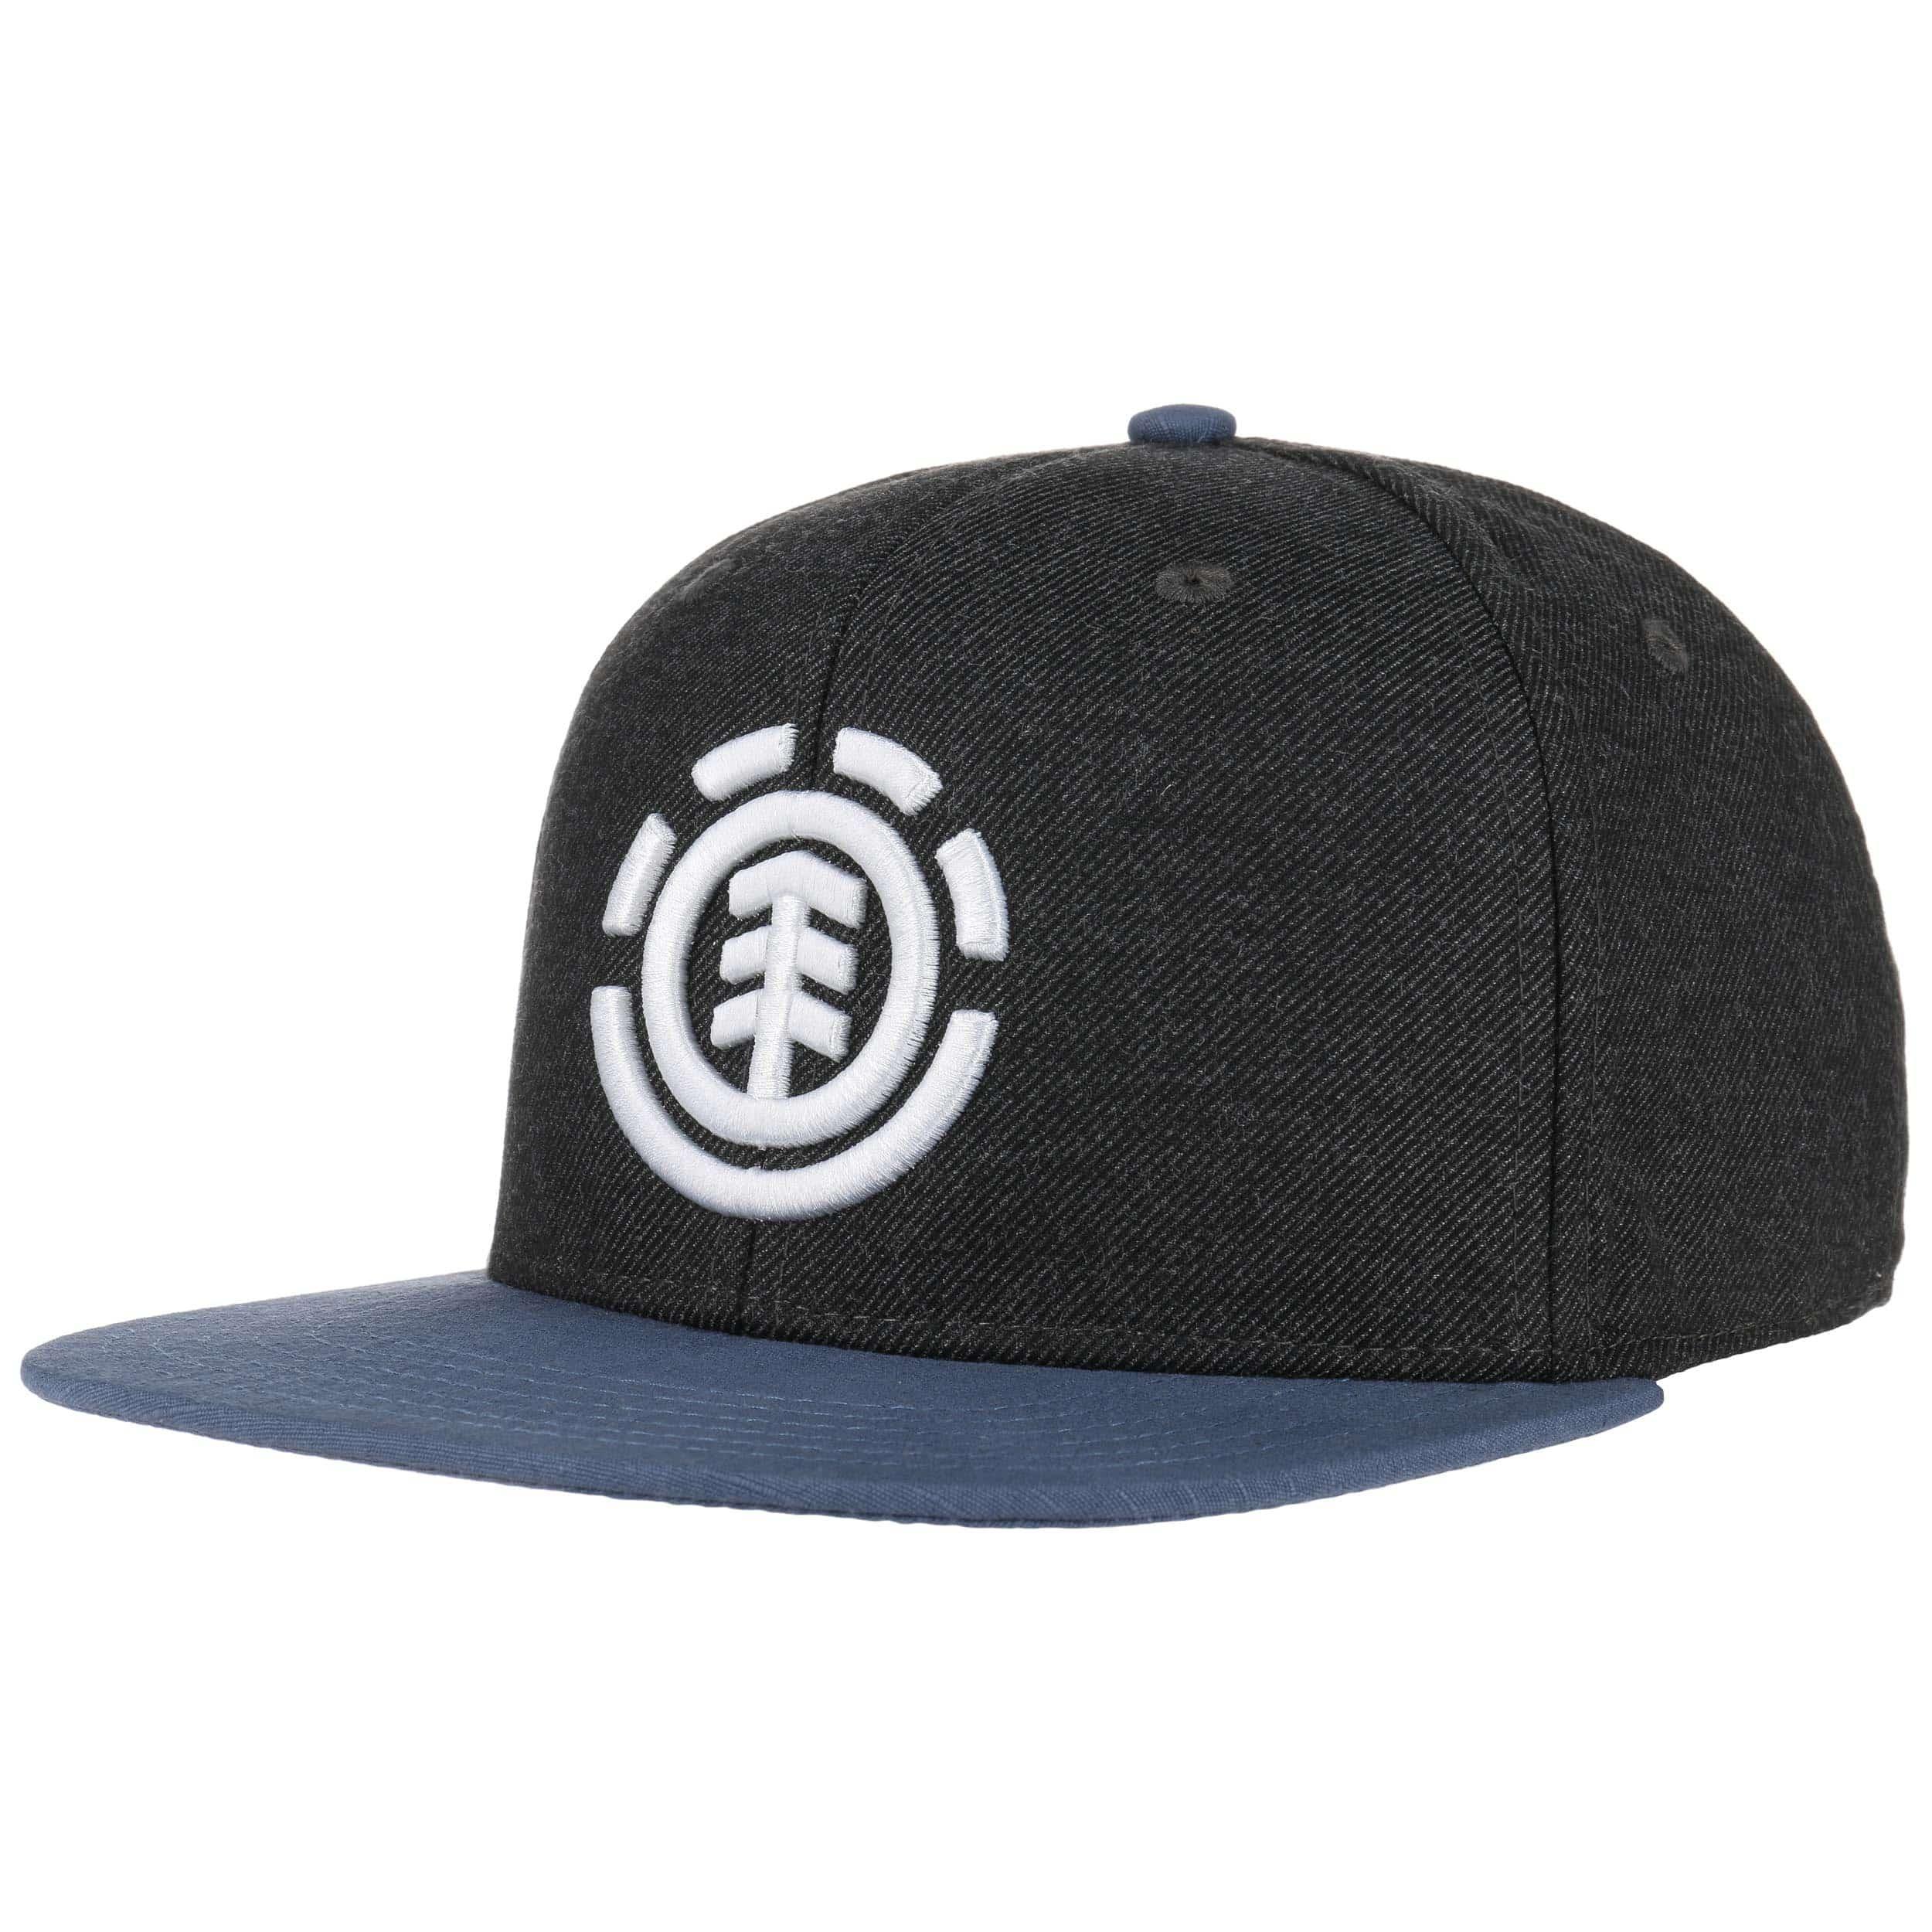 Gorra Knutsen B Snapback by element - Gorras - sombreroshop.es 8f2b5a2d260